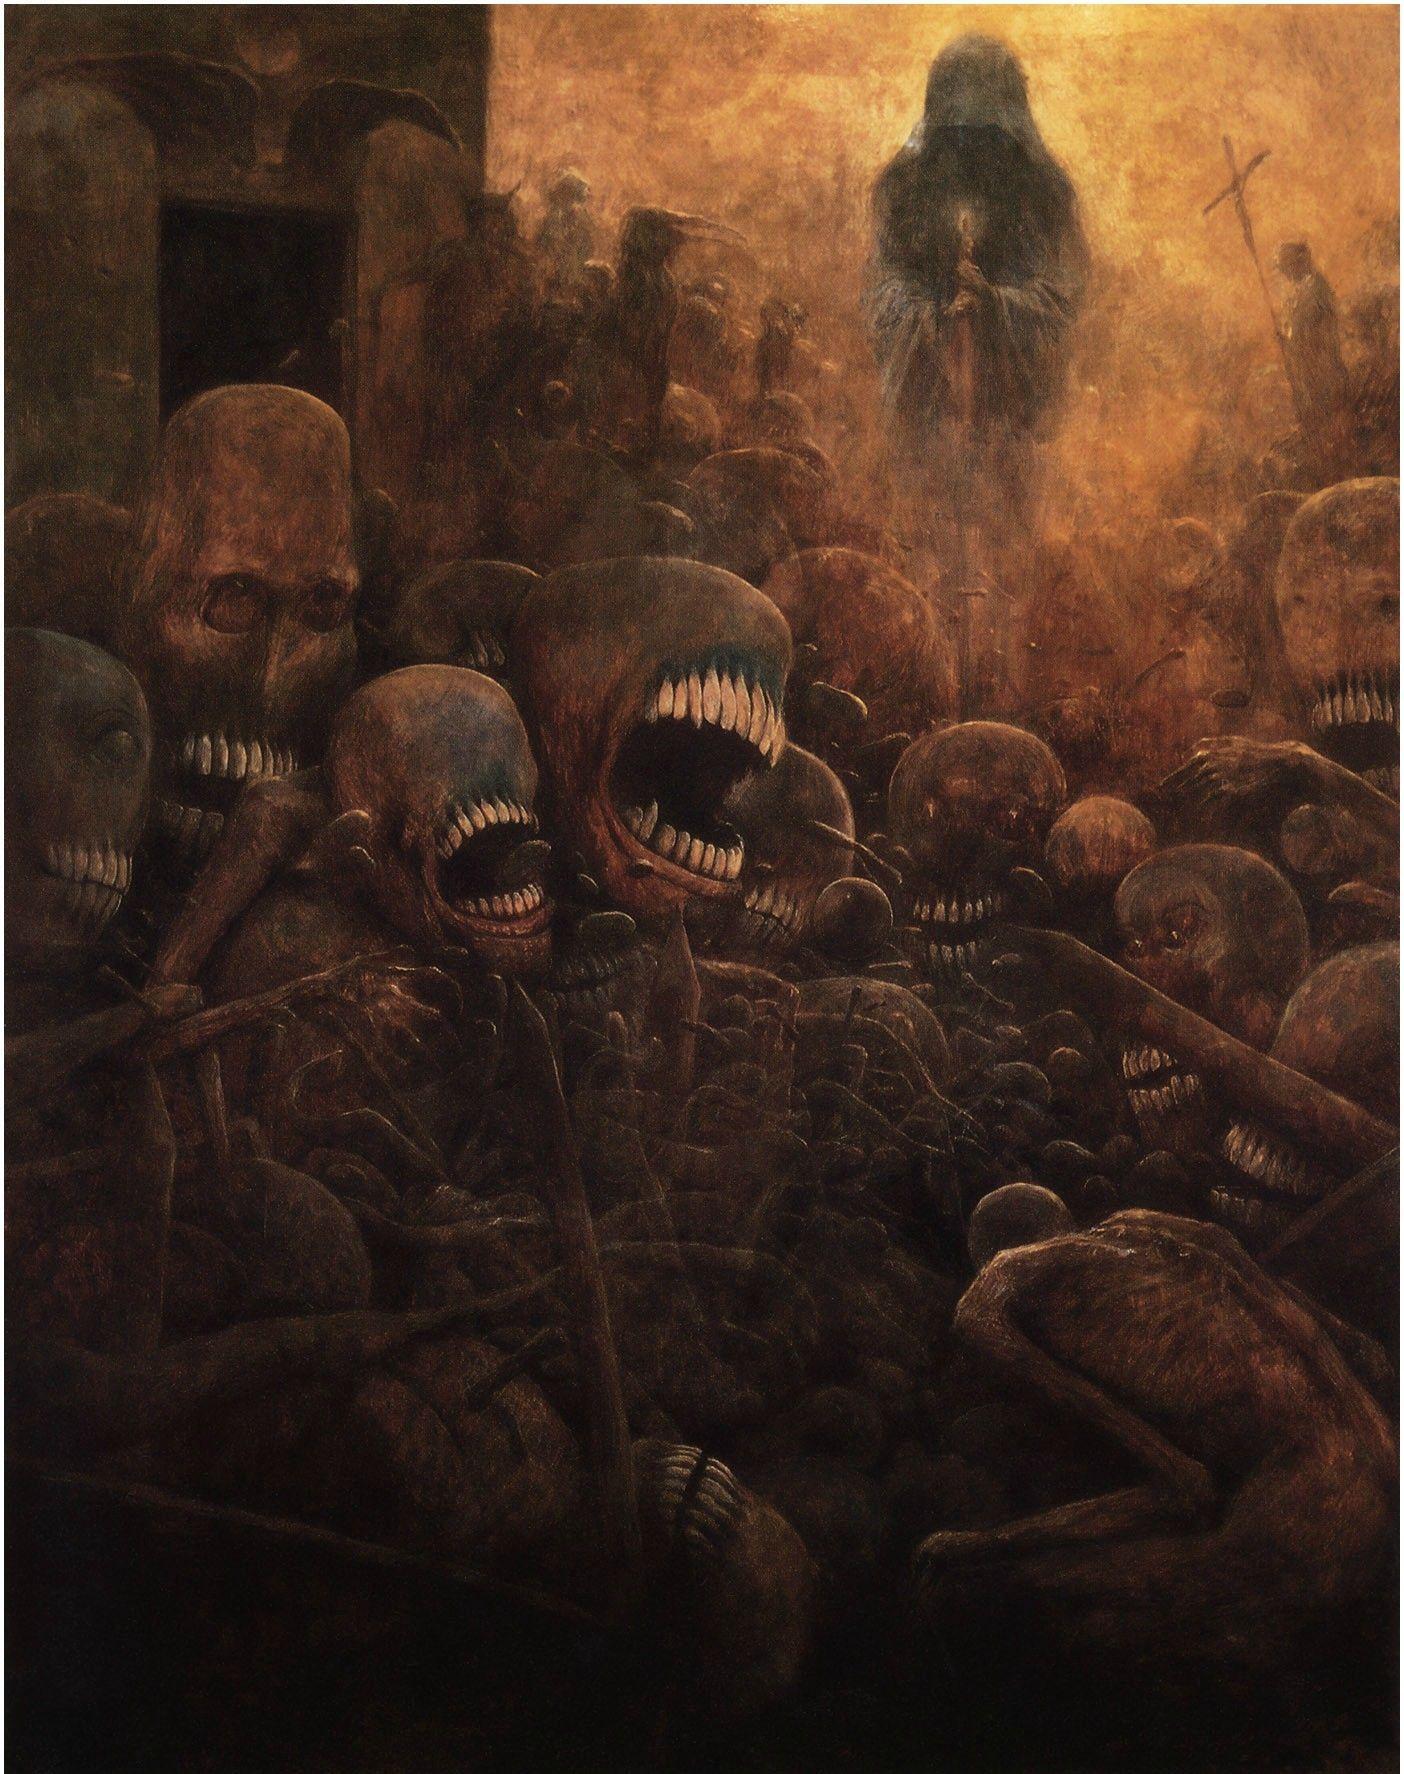 Zdzislaw Beksinski Art Nightmare Fuel 怖い絵 ベクシンスキー